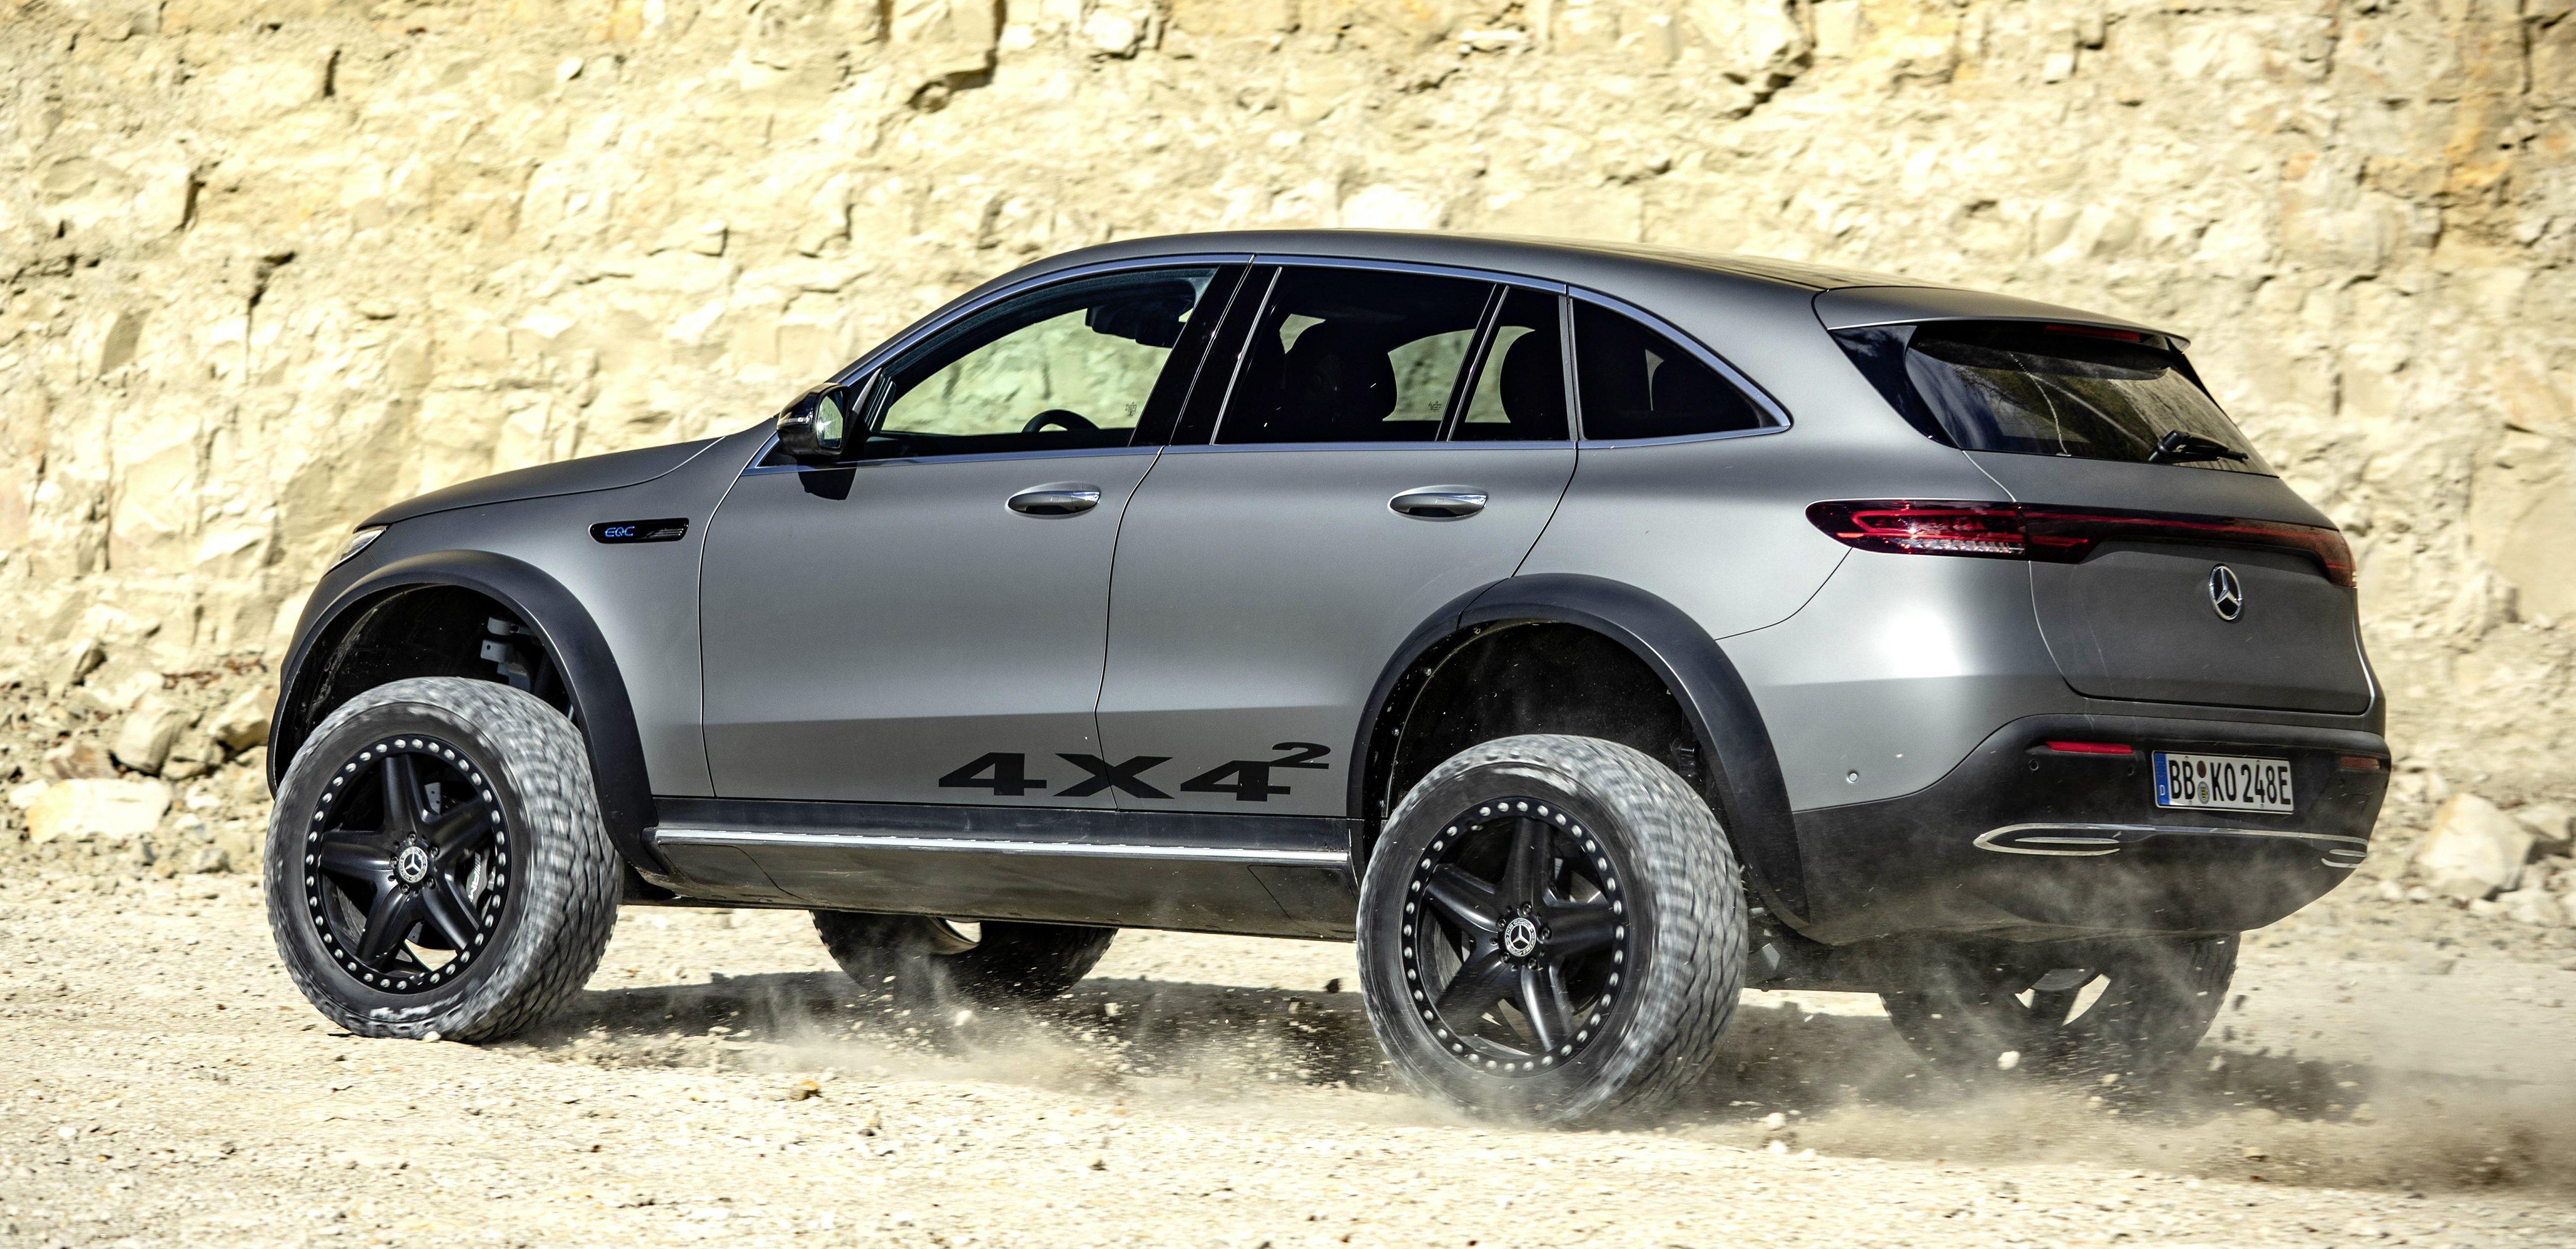 Mercedes Benz Unveils Rugged Eqc 4x4 Electric Off Road Suv Electrek